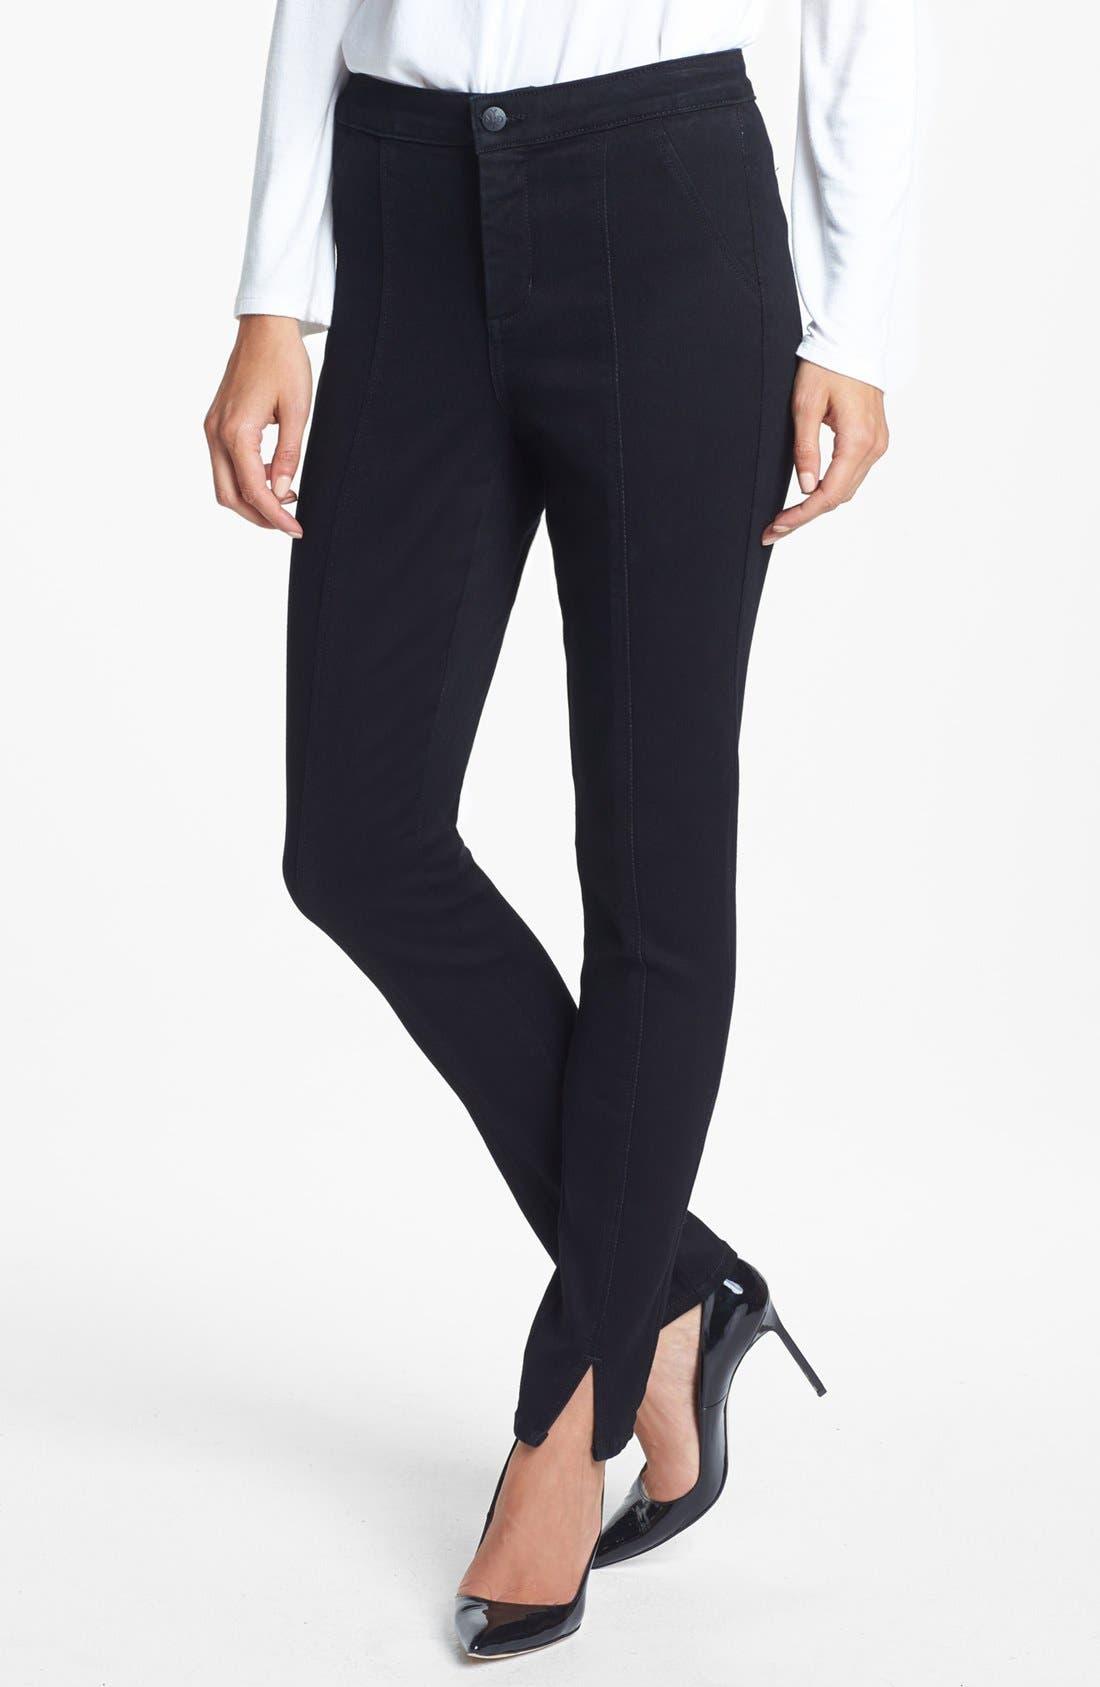 Alternate Image 1 Selected - NYDJ 'Lotus' Stretch Skinny Jeans (Overdye Black)